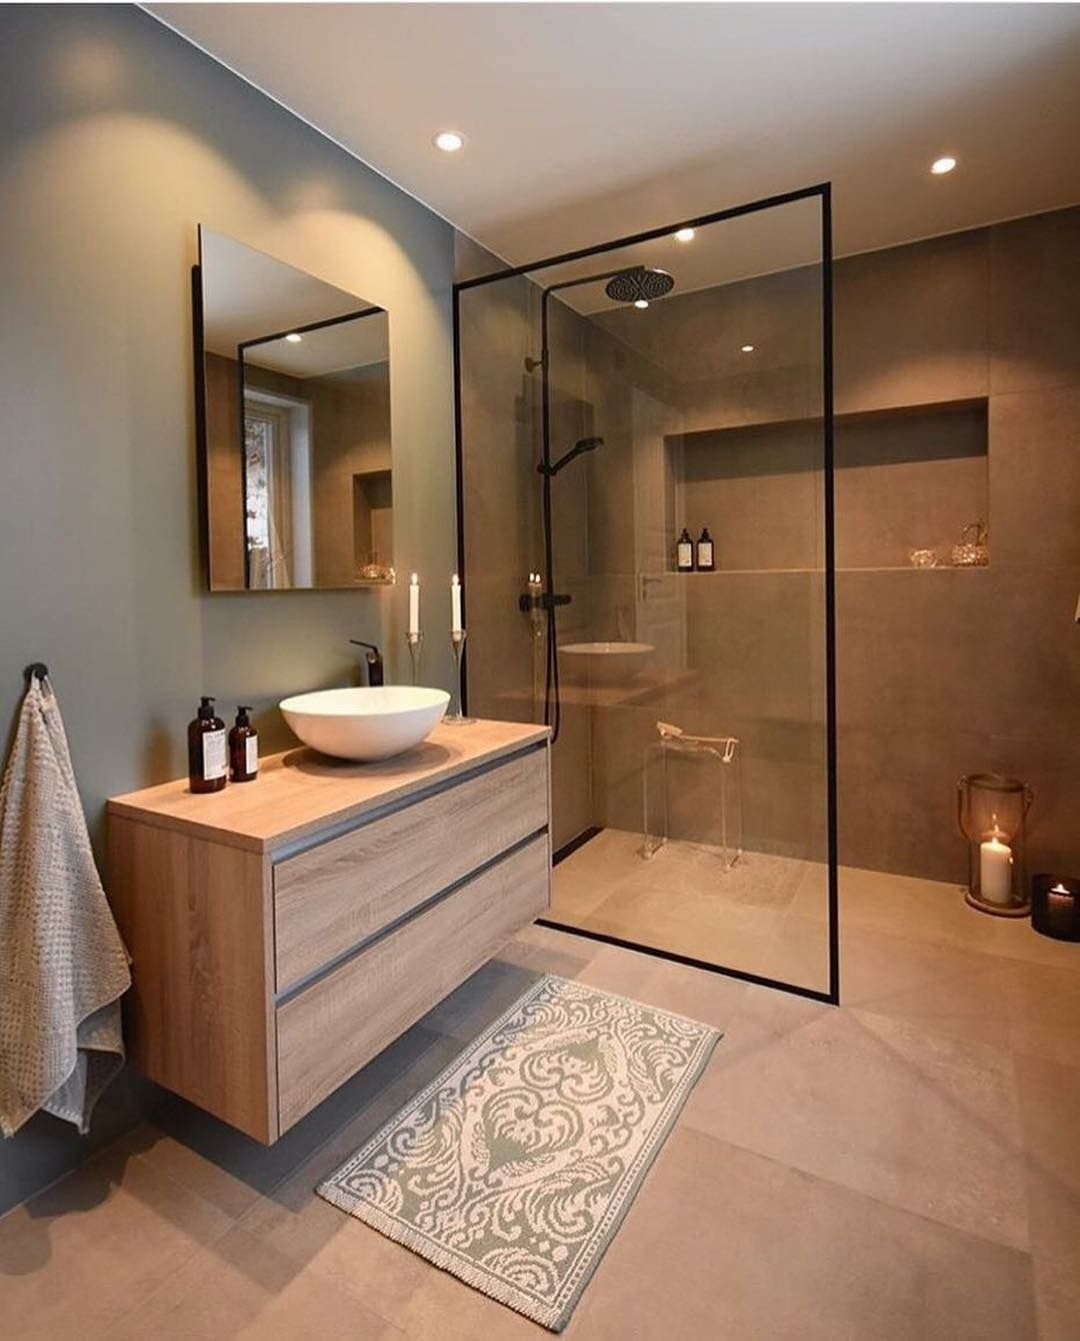 Top 5 Bathroom Inspiration This Weekthe Perfect Scandinavian Style